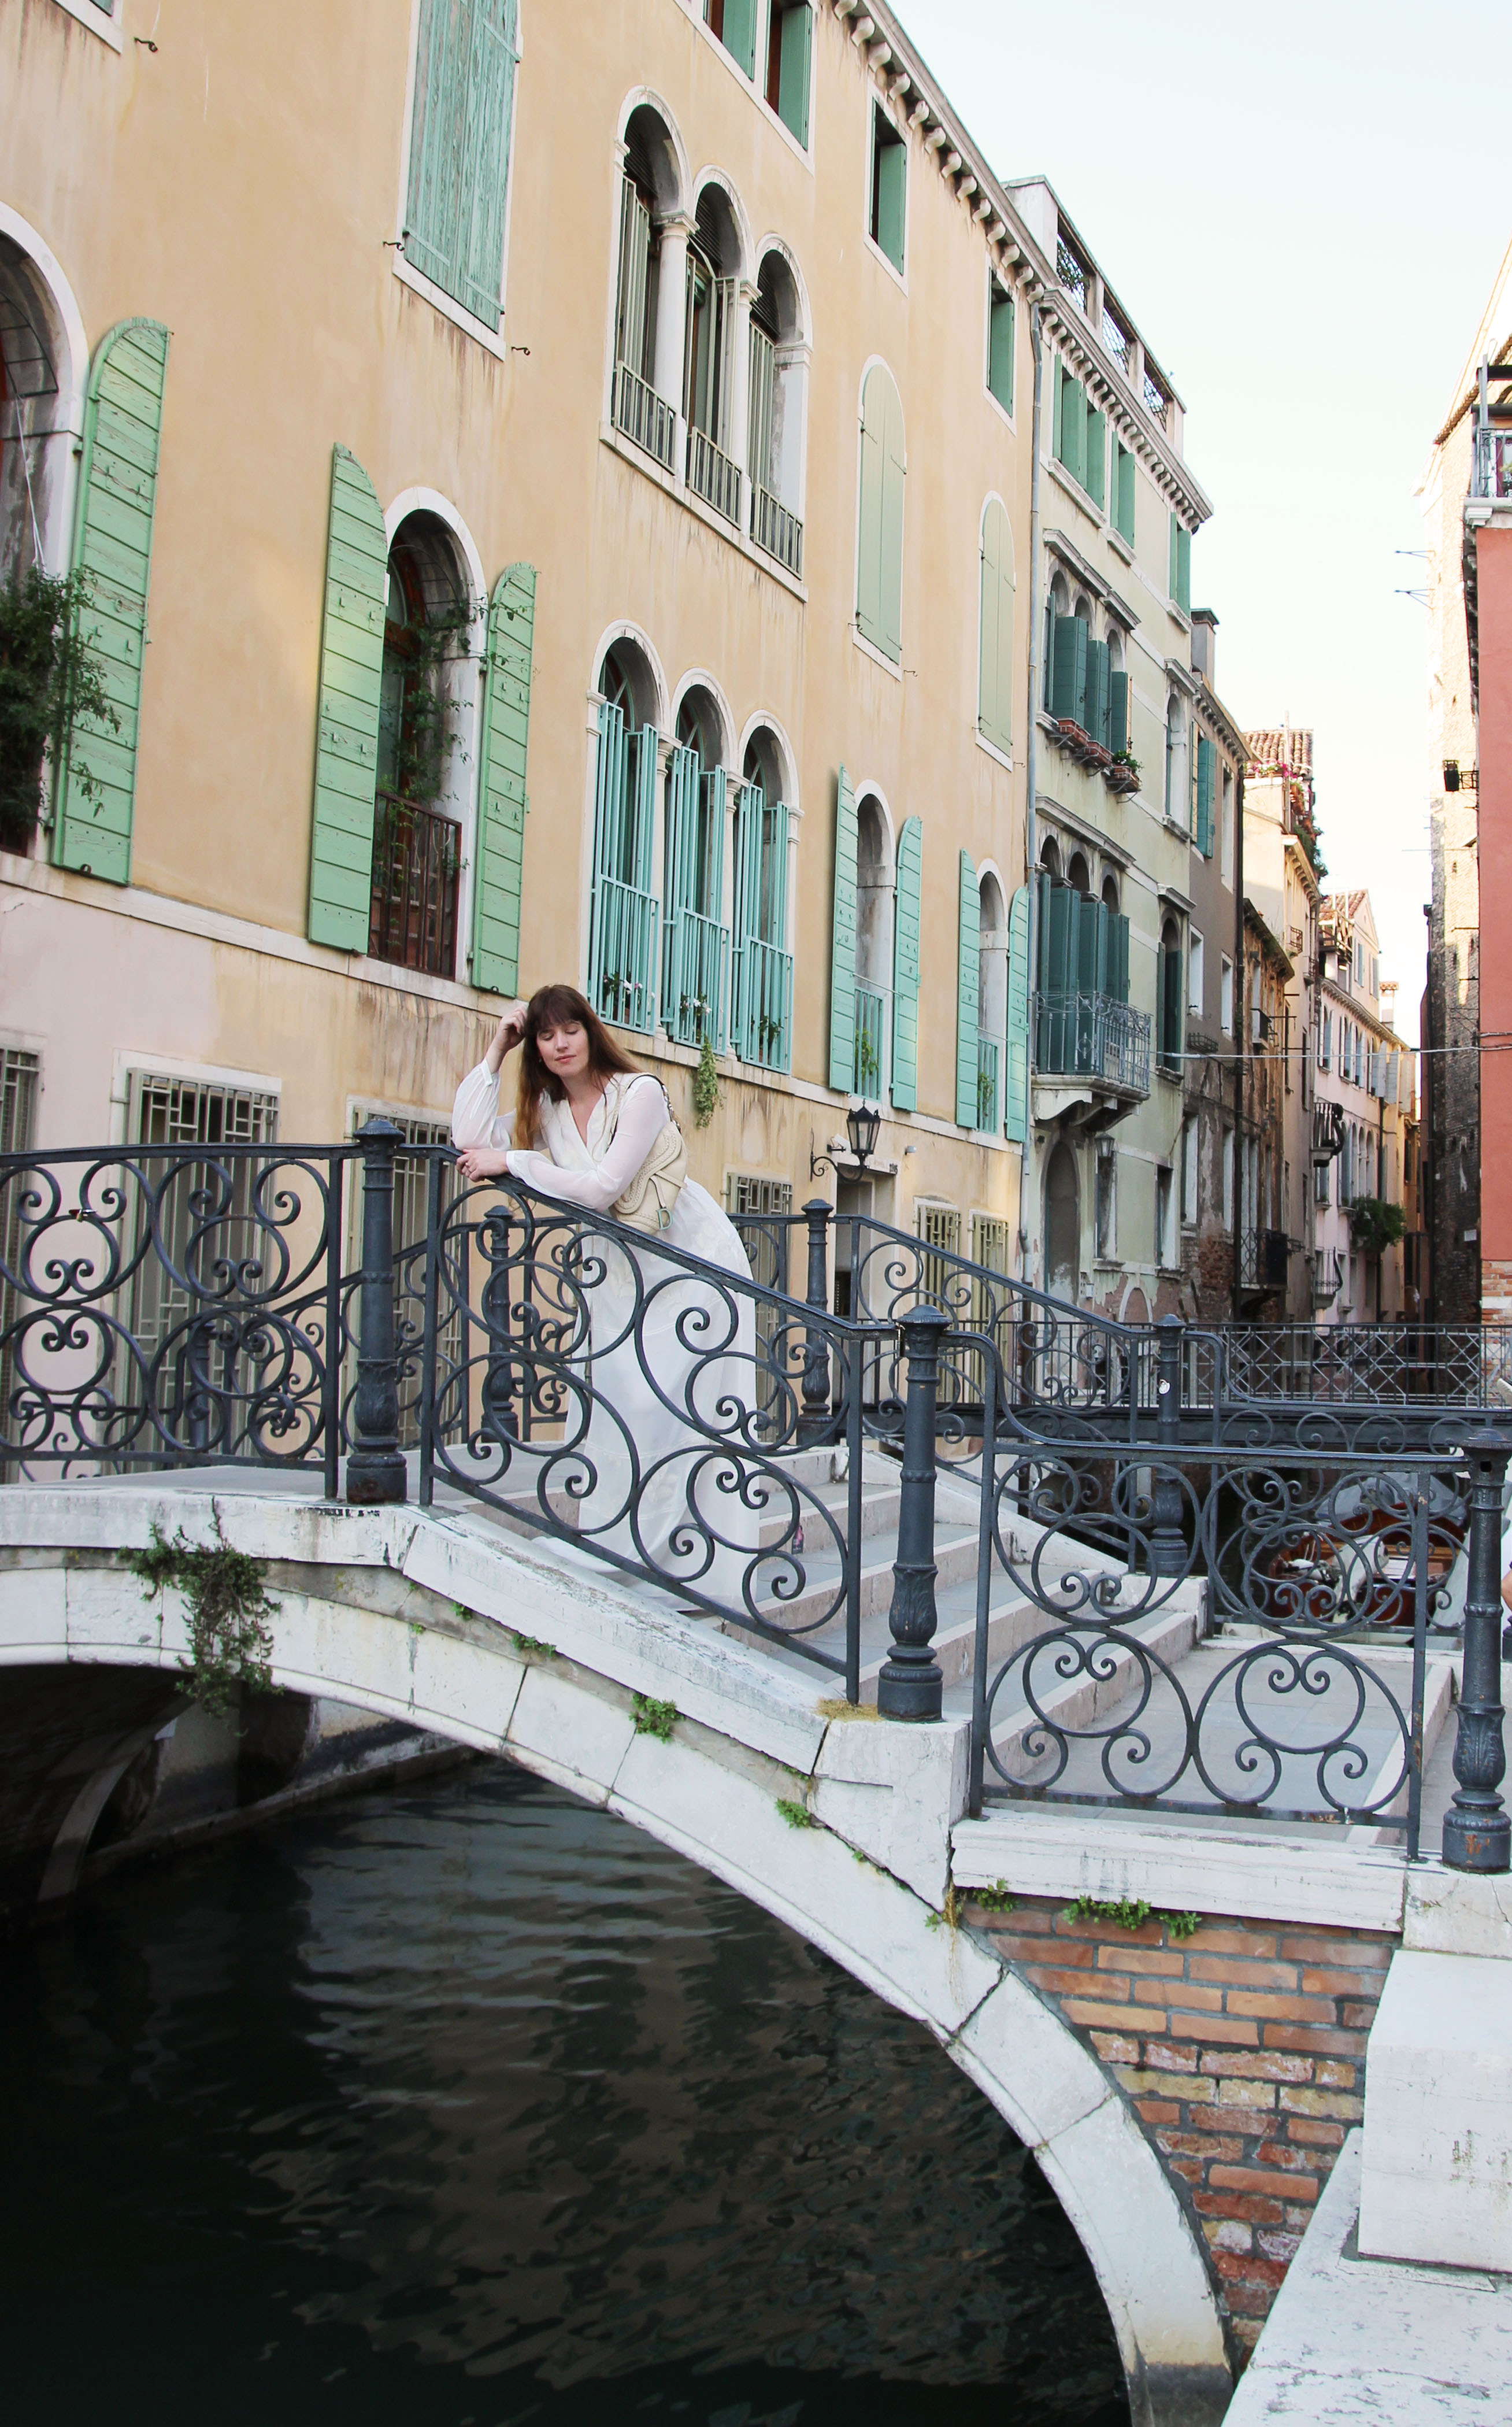 mia_und_ich_blog_modeblog_fahionblog_maxikleid_maxidress_embroidery_stickereien_travel_reisen_venezia_venice_venedig_italien_italy